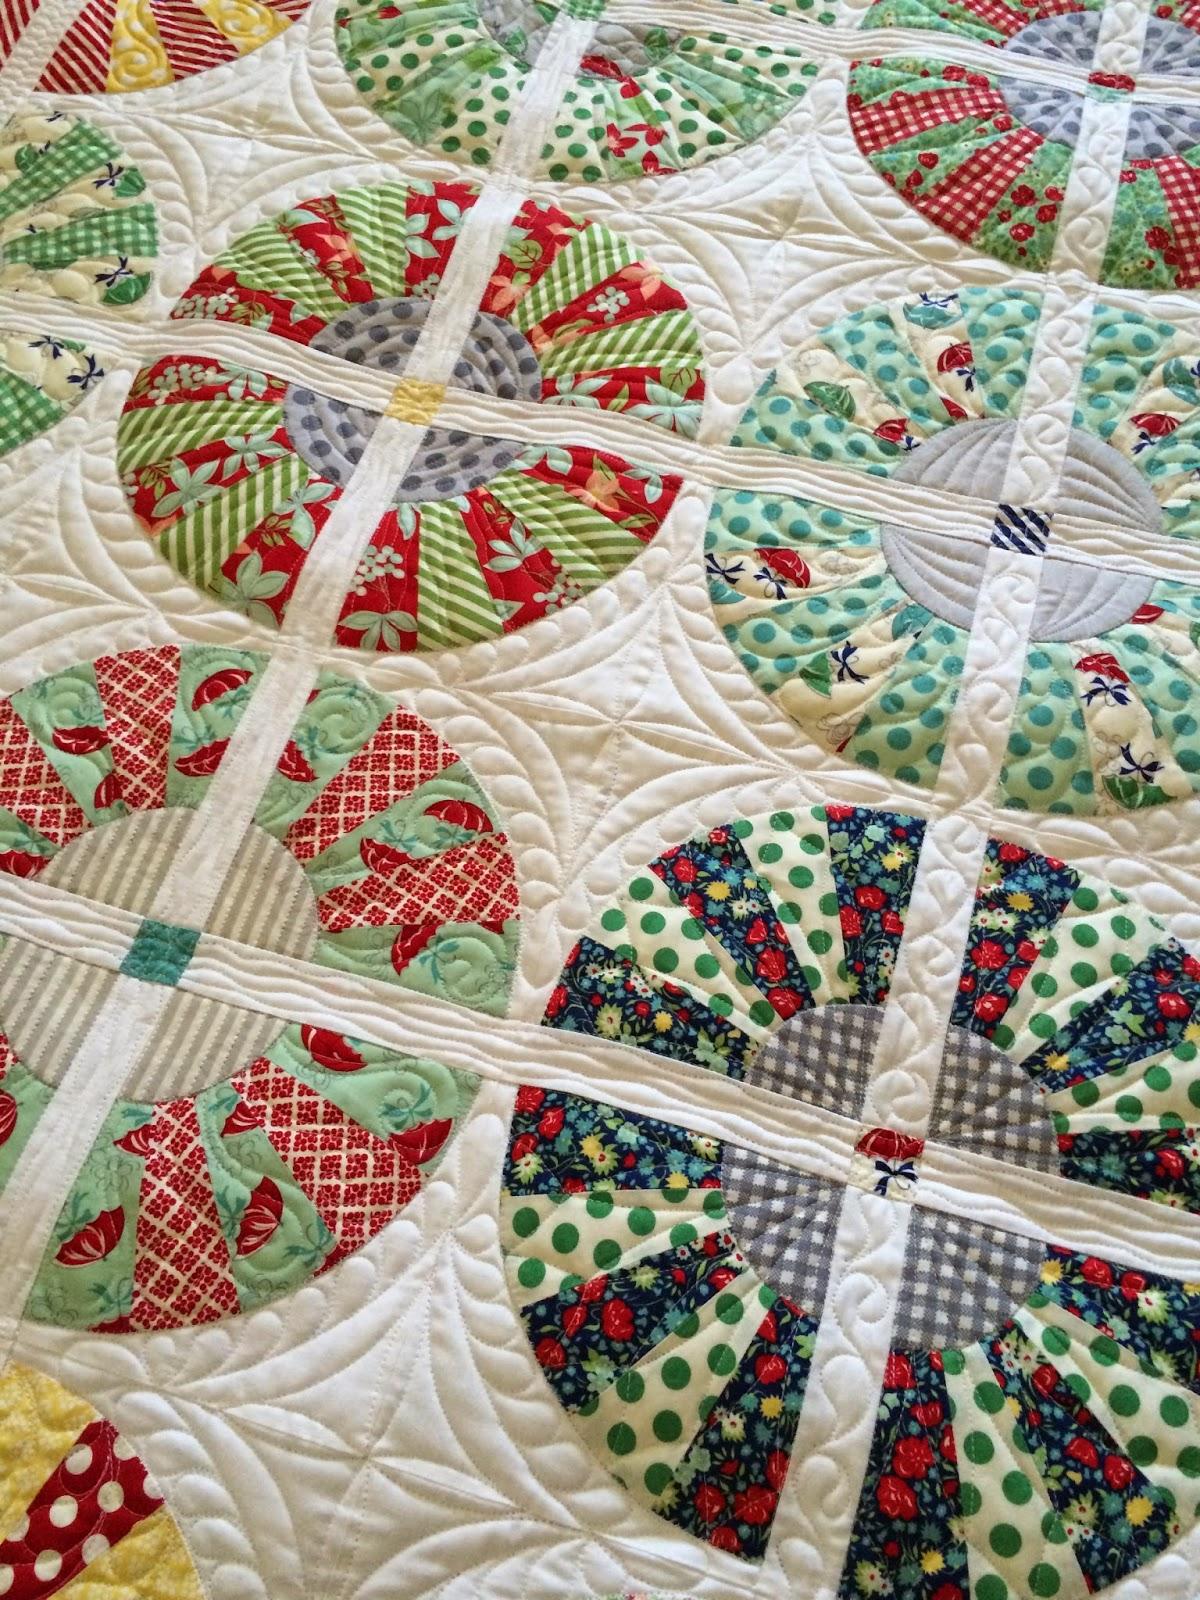 Crochet Patterns Quilt Blocks : Sewing/knitting/crochet/etc. on Pinterest Quilt Blocks ...